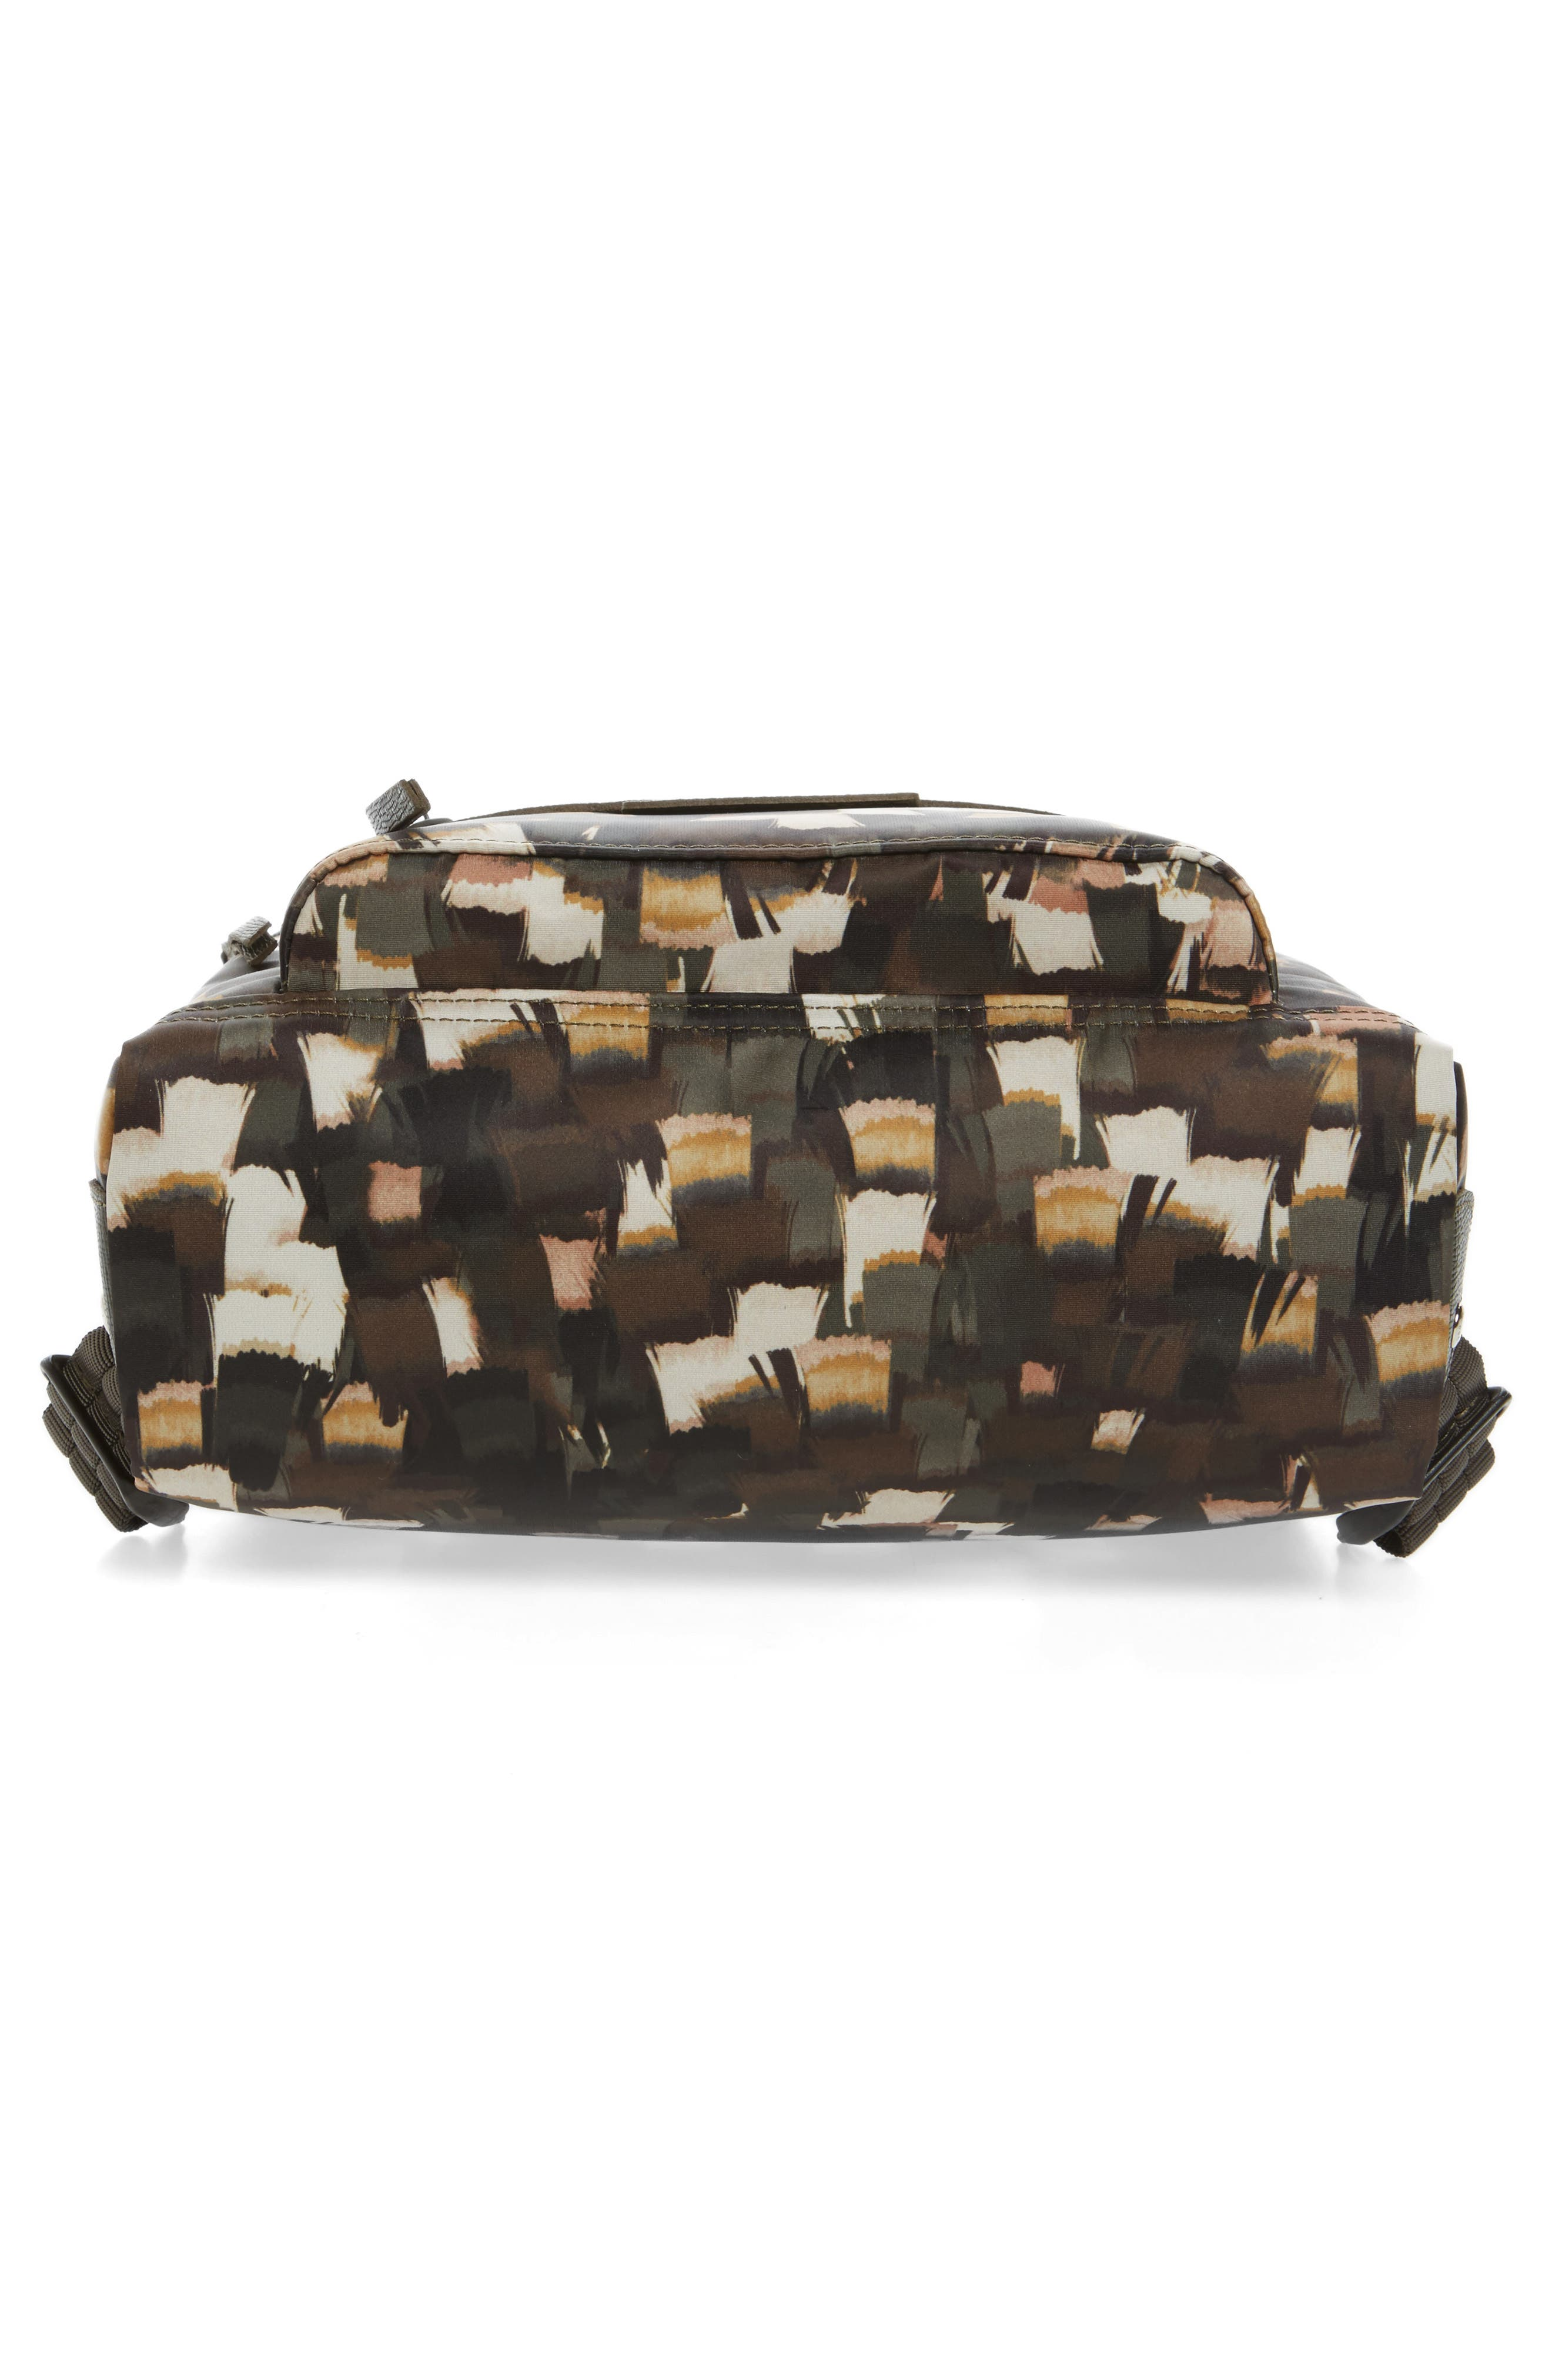 Le Pliage Neo - Vibrations Nylon Backpack,                             Alternate thumbnail 5, color,                             Khaki